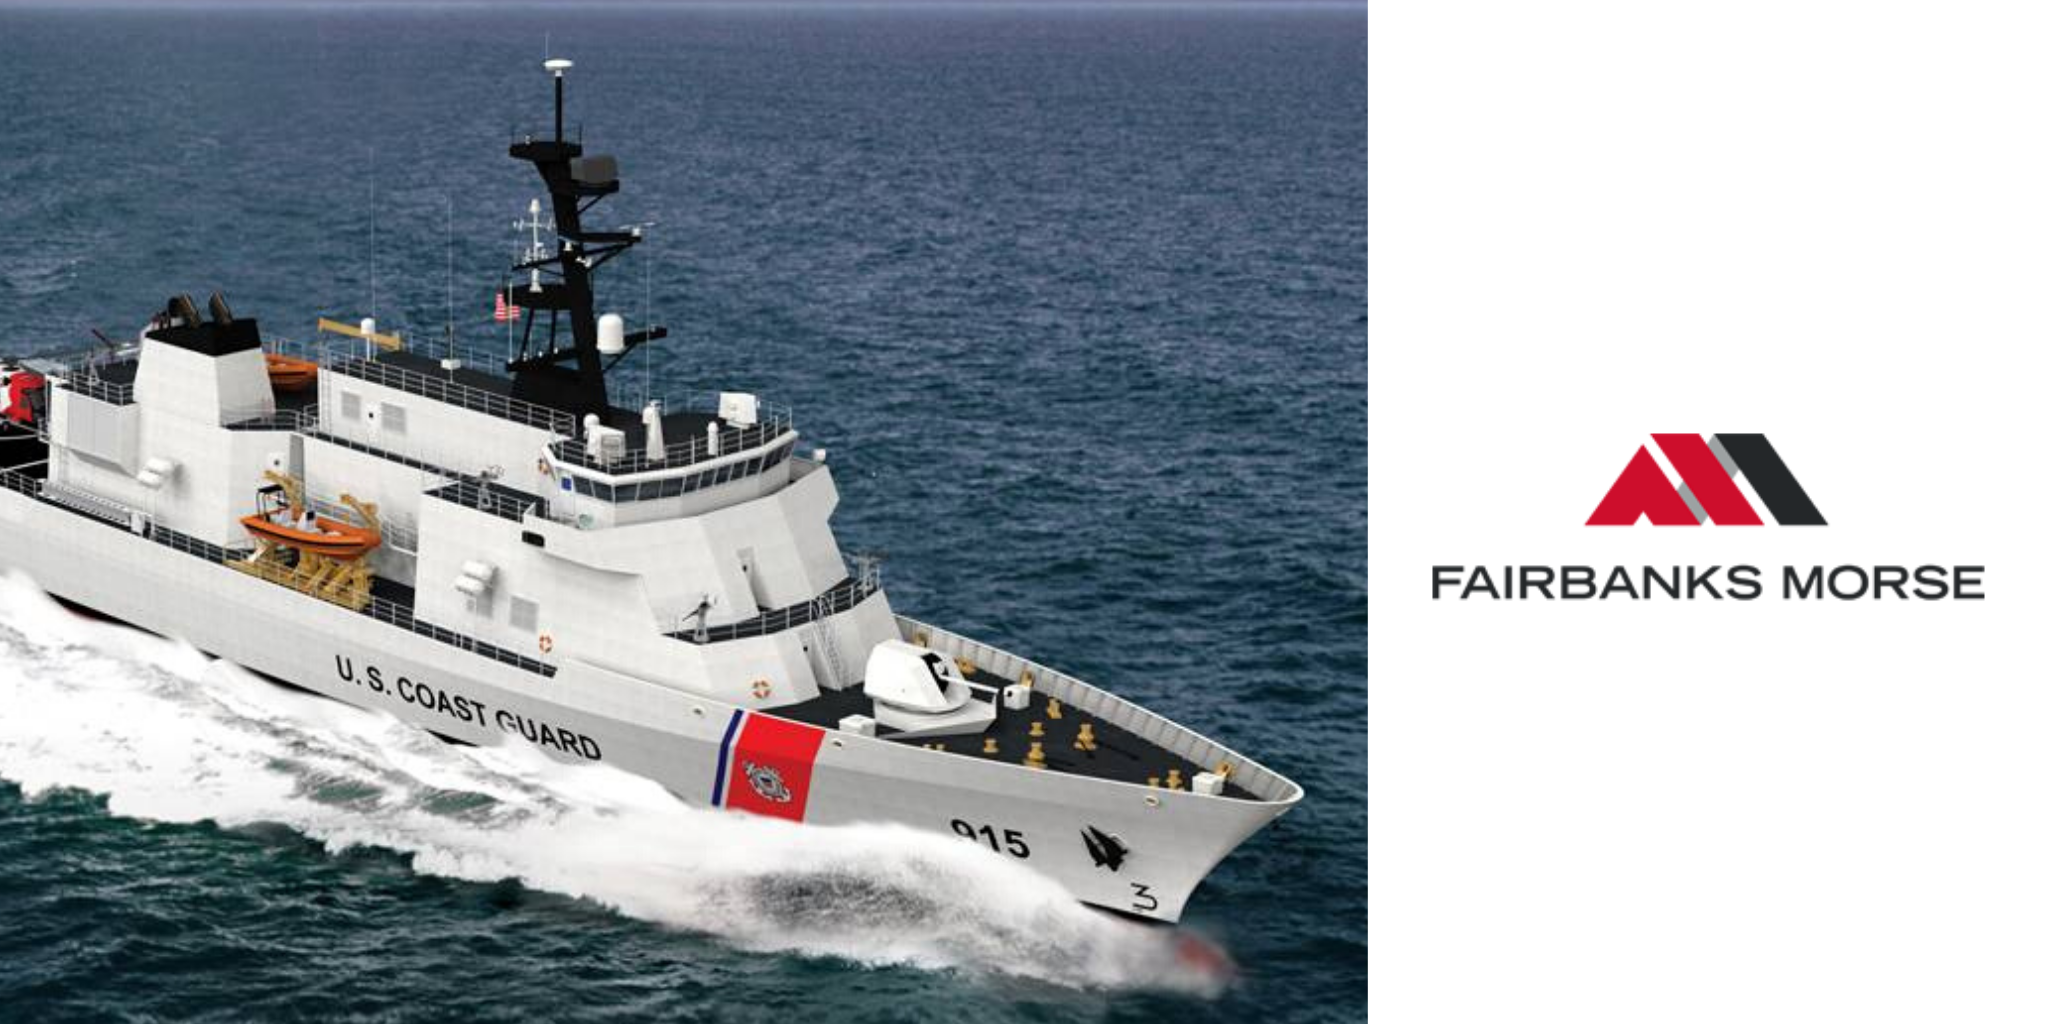 Fairbanks Morse to Power US Coast Guard's Offshore Patrol Cutter (USCGC) INGHAM